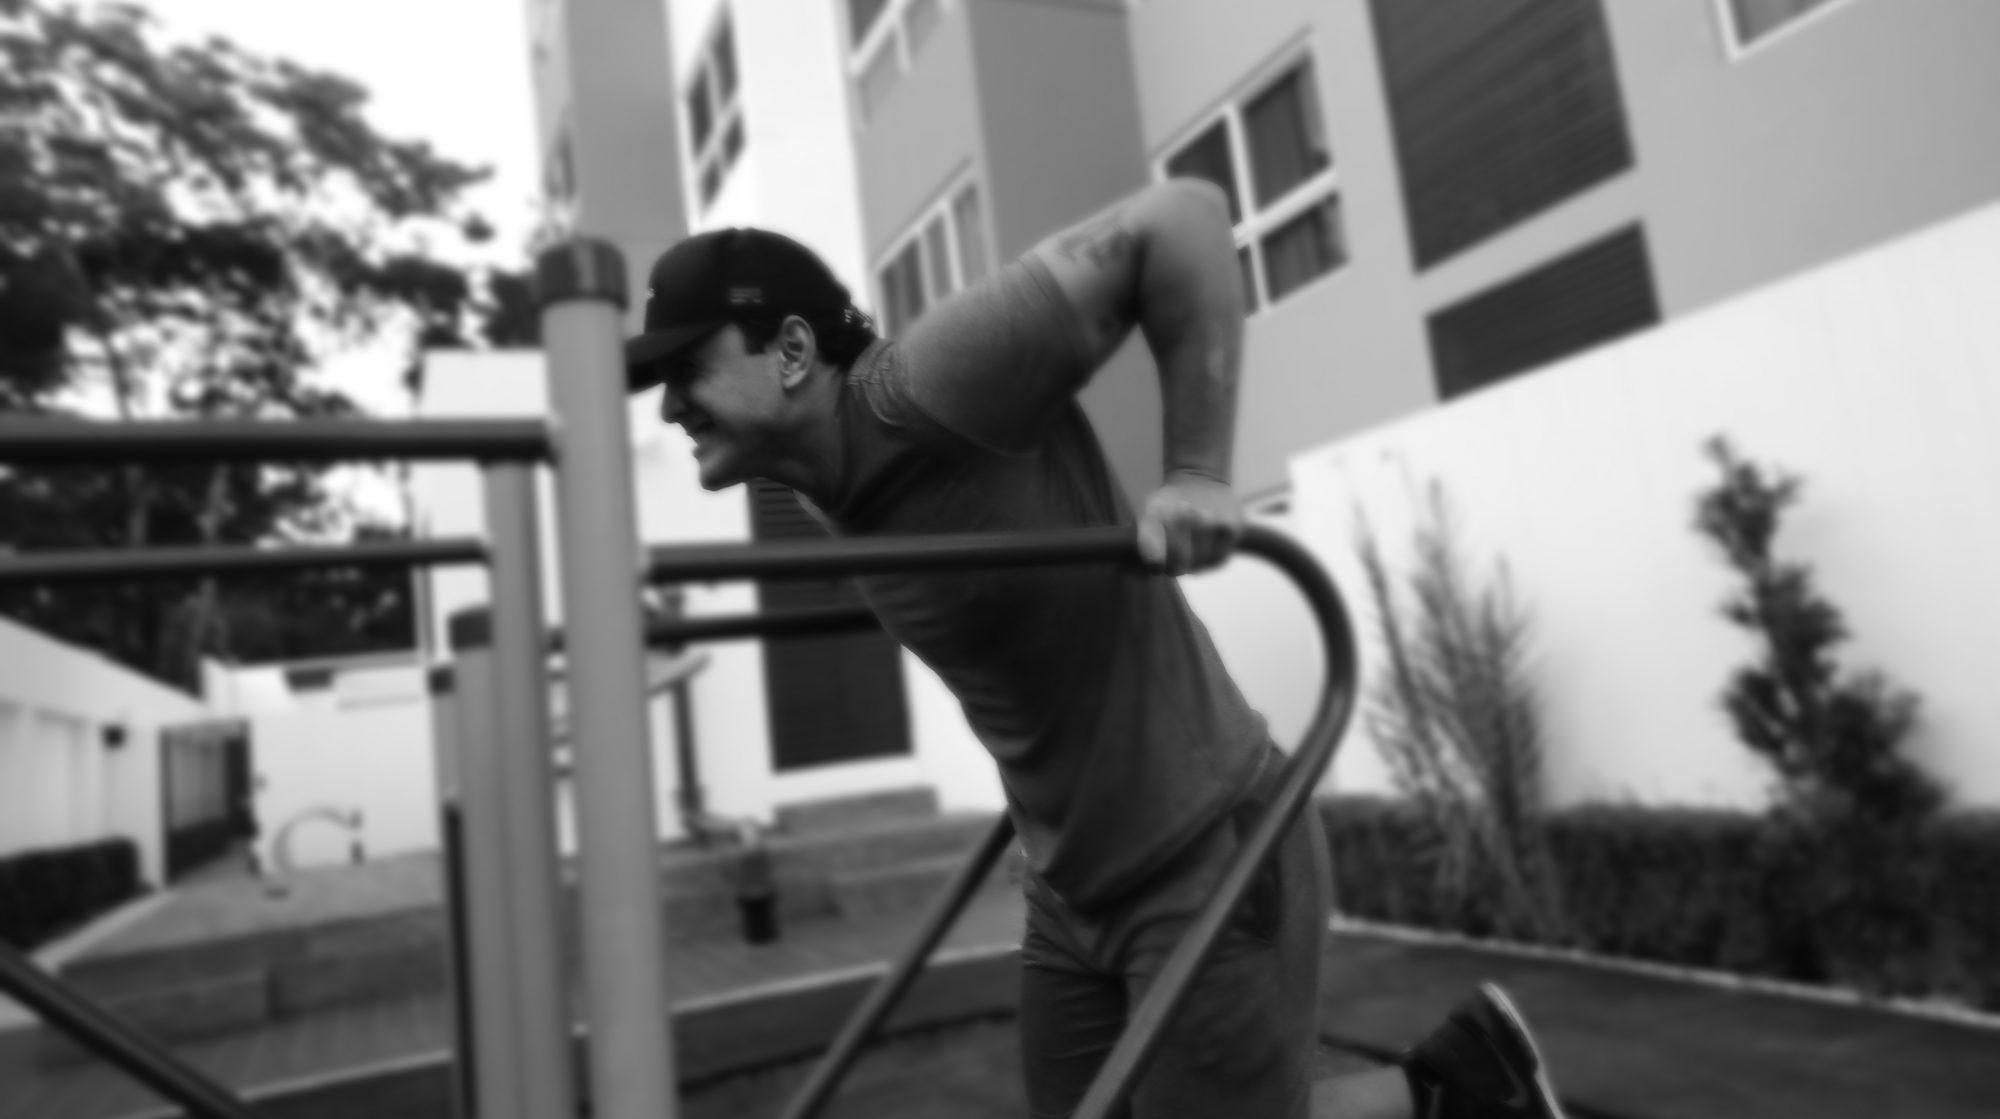 BreakRecordz Fitness & Motivation